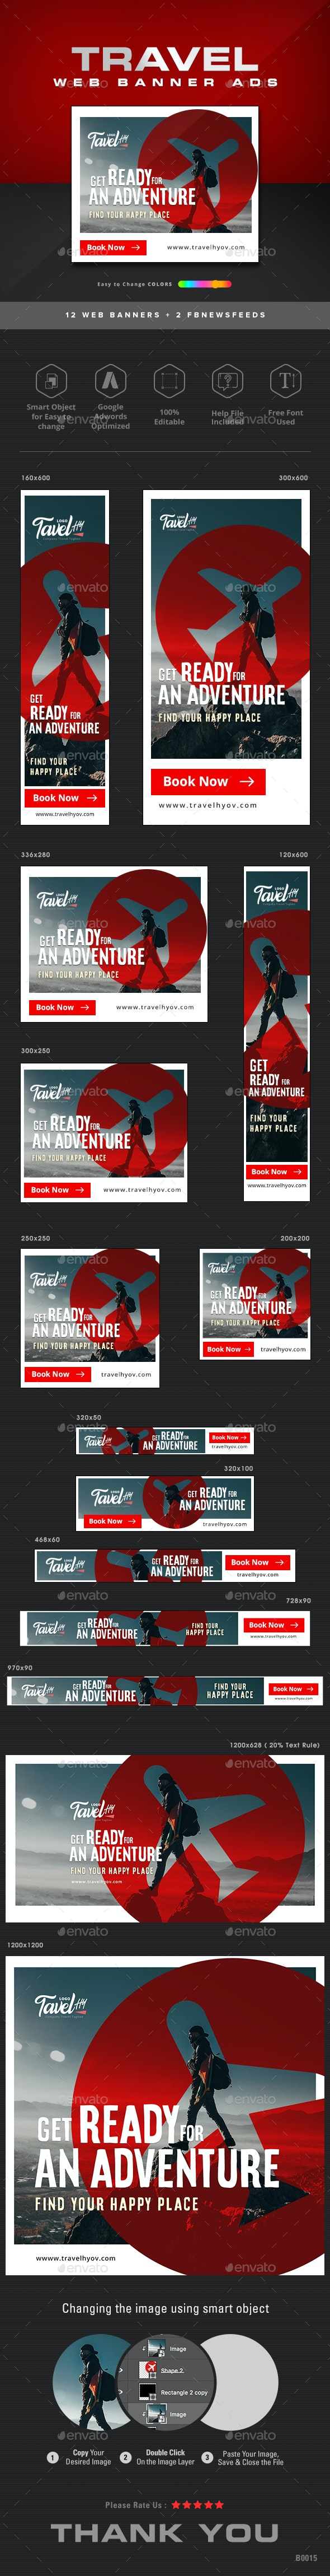 Travel Web Banner Set - Banners & Ads Web Elements